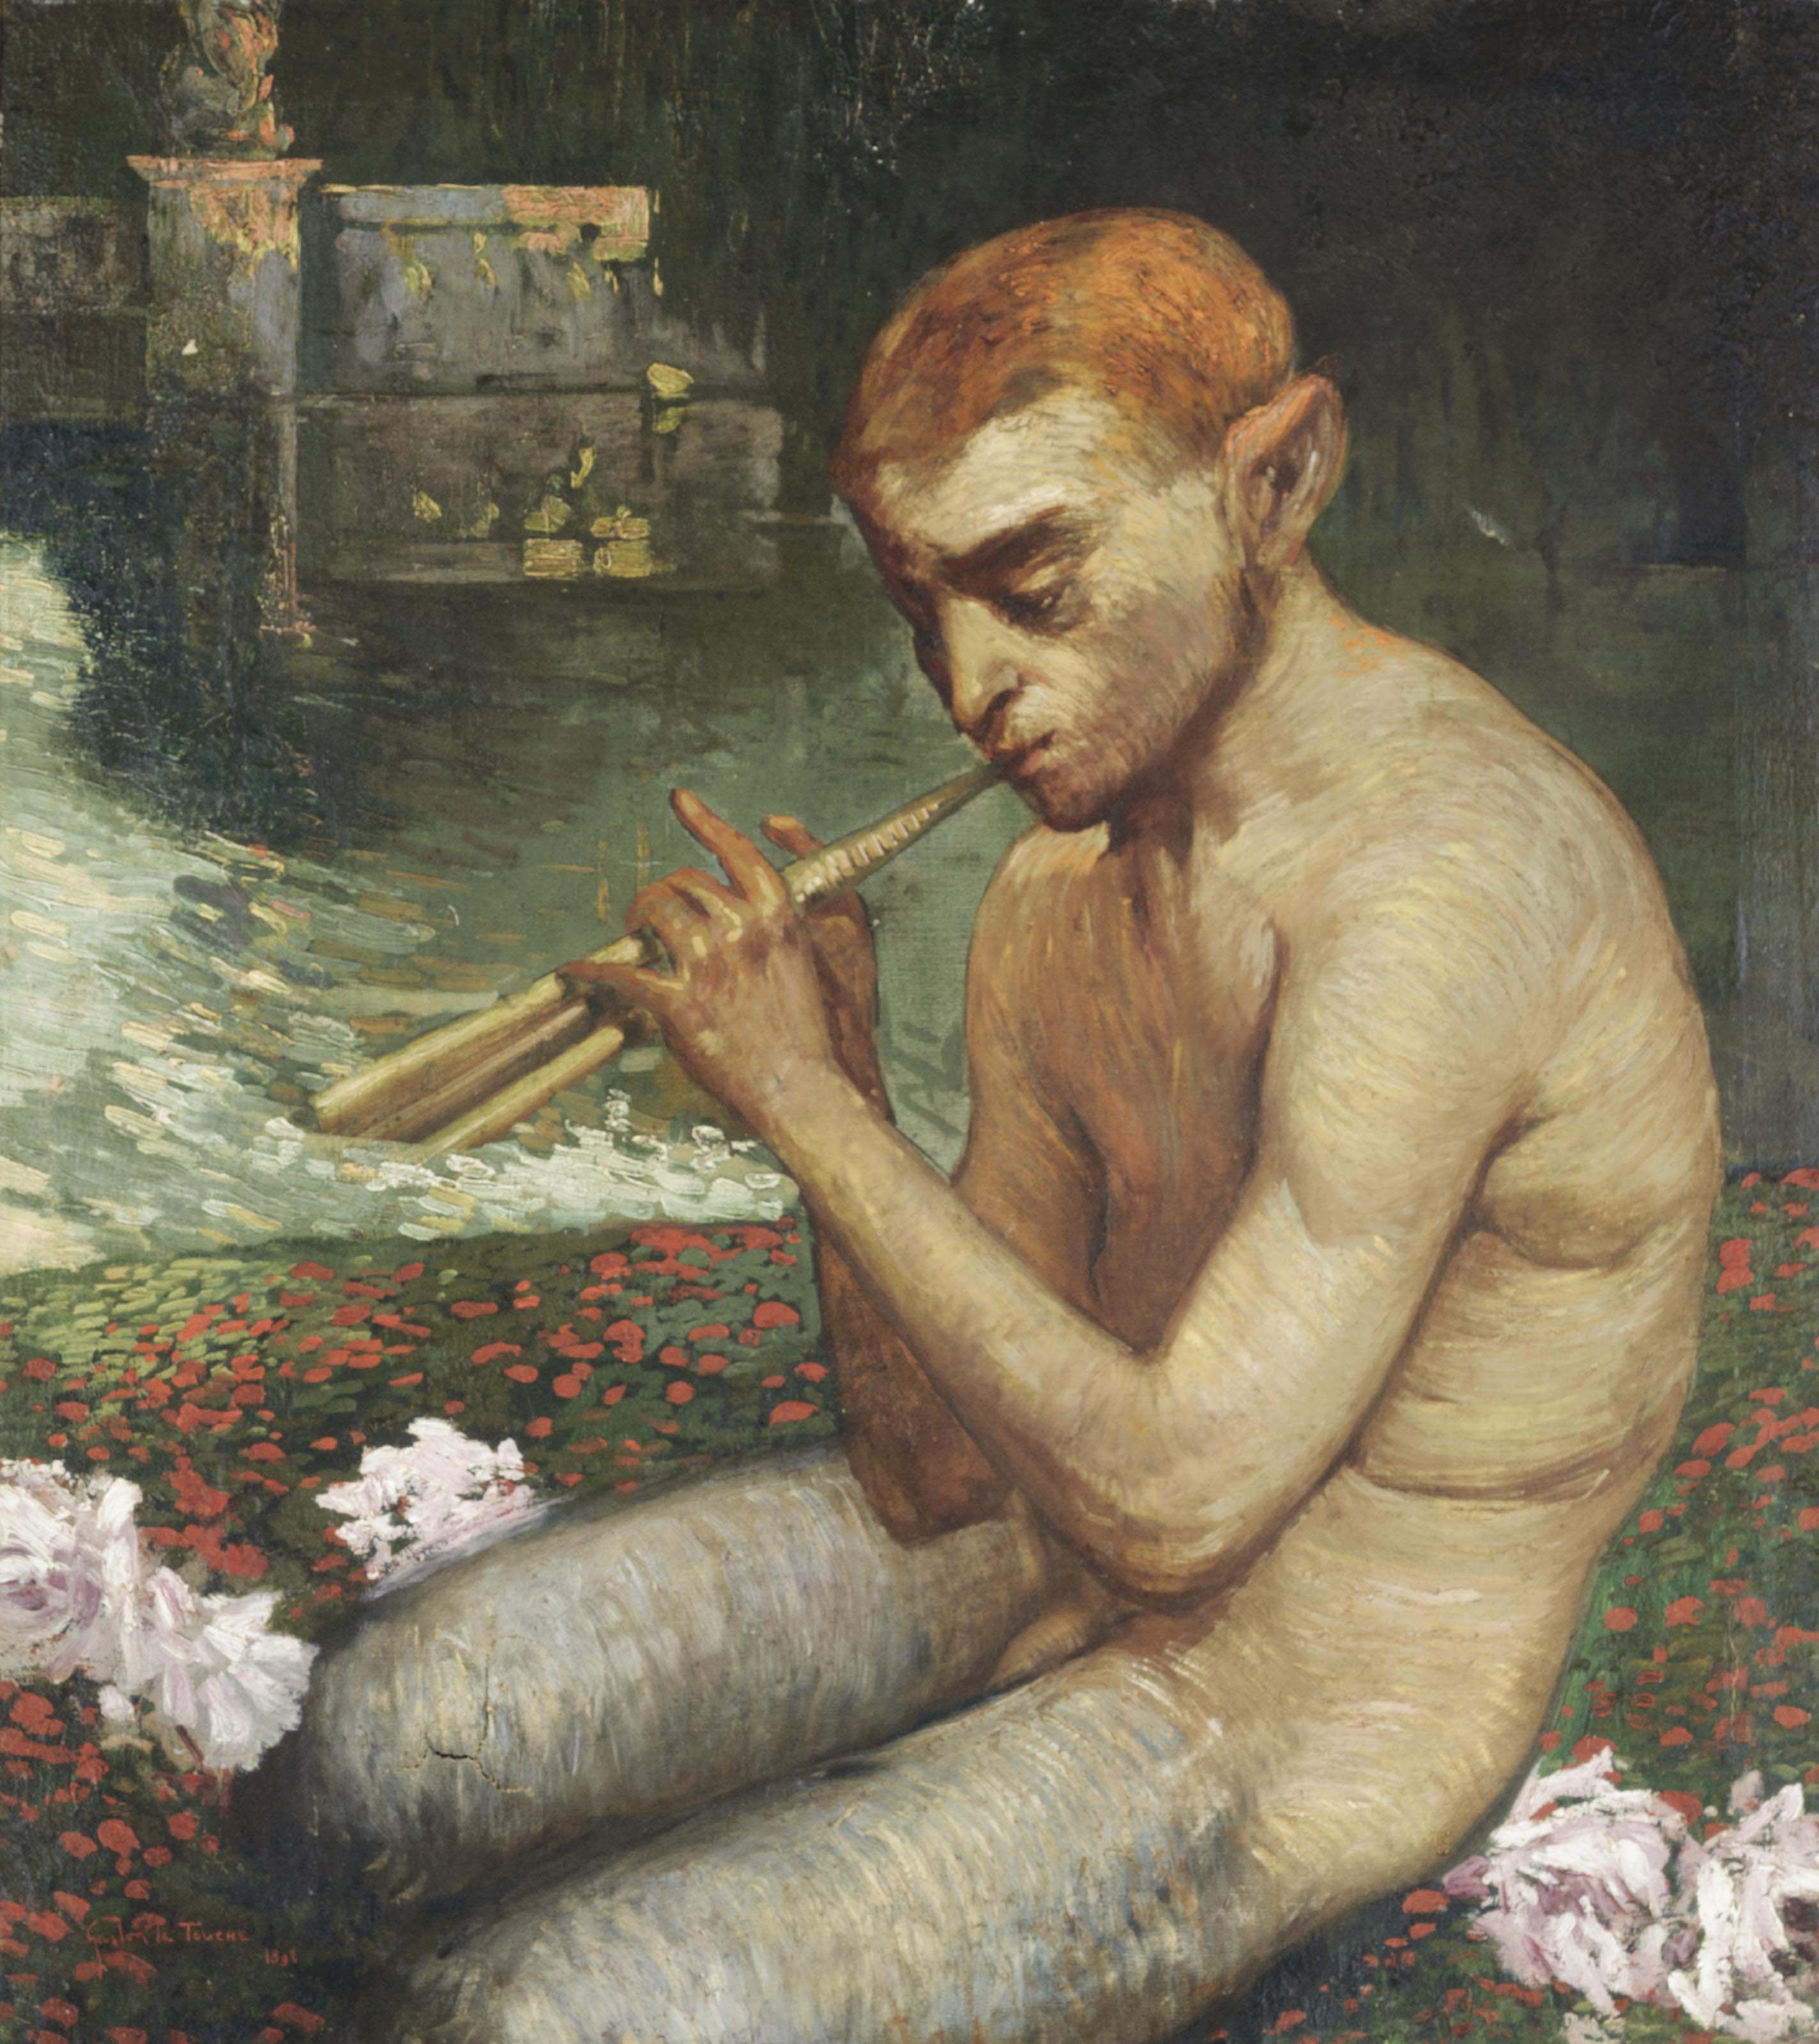 Gaston La Touche (French, 1854